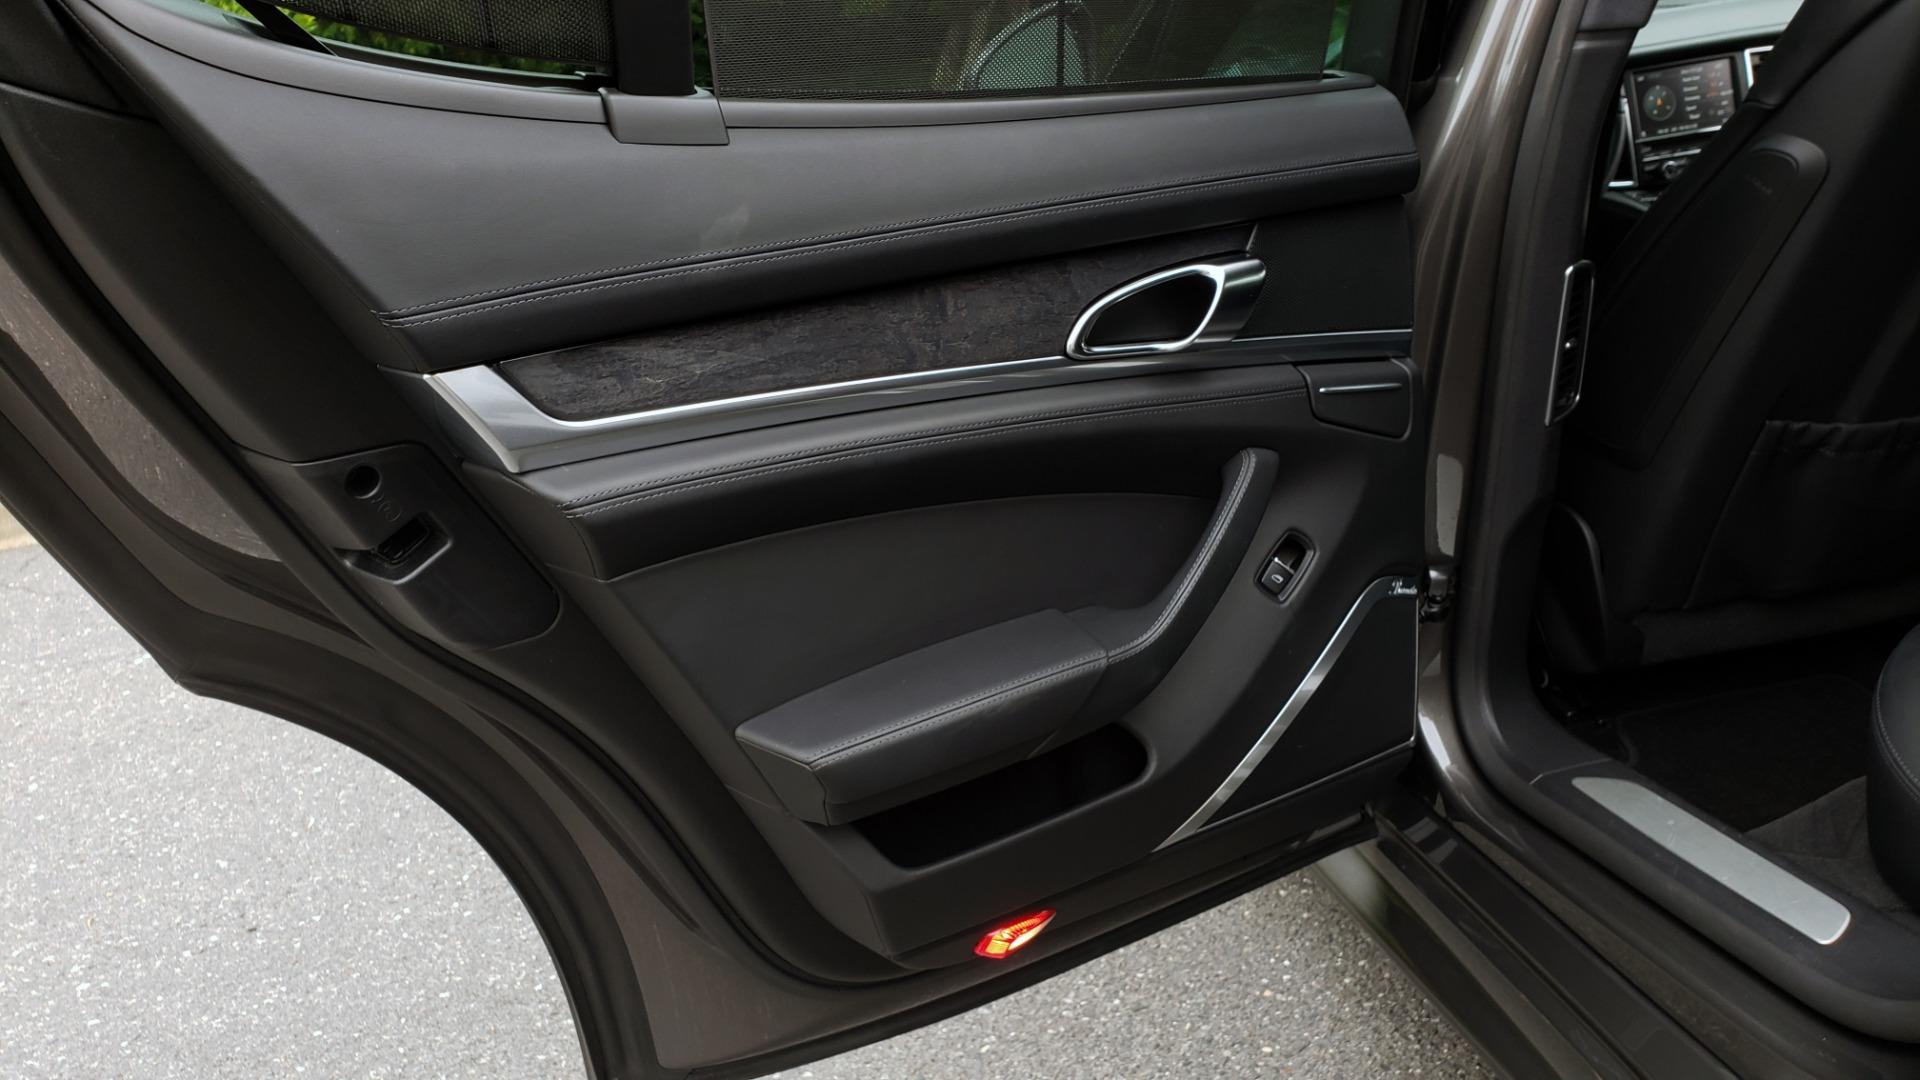 Used 2013 Porsche PANAMERA TURBO 4.8L V8 / AWD / NAV / SUNROOF / LCA / PARK ASST / BURMESTER for sale $45,995 at Formula Imports in Charlotte NC 28227 60